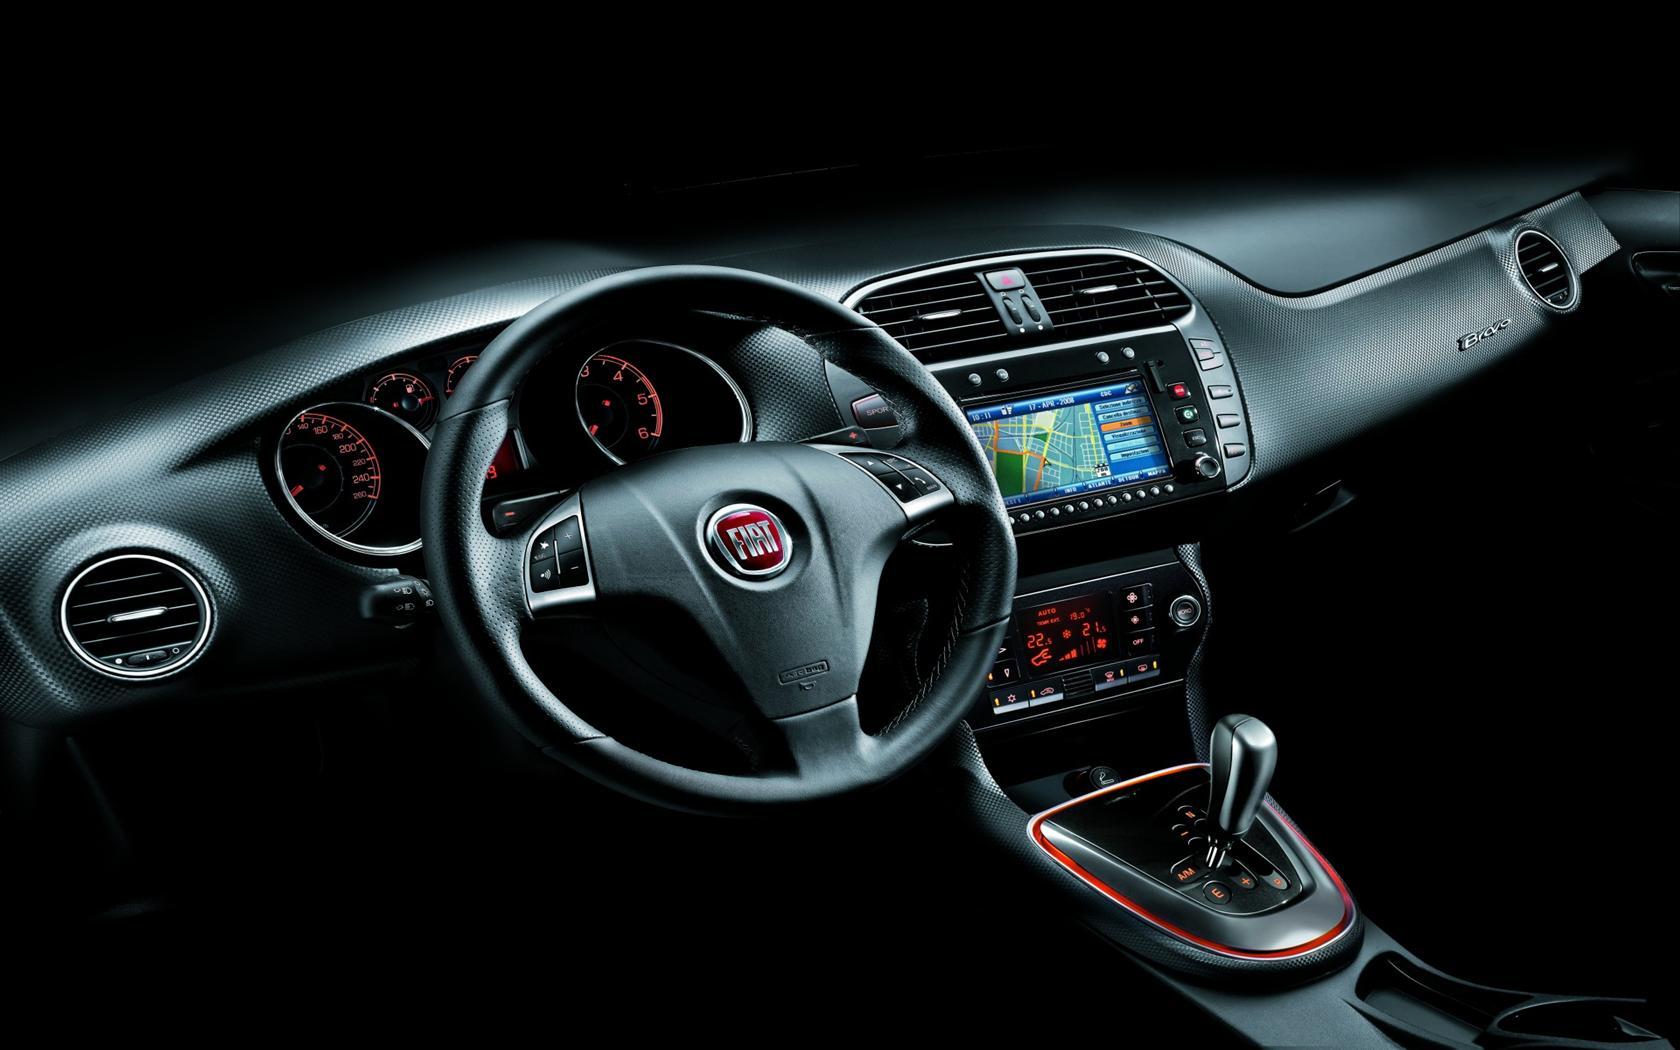 Fiat-Bravo-Sedan-Interior-09_06-1680.jpg